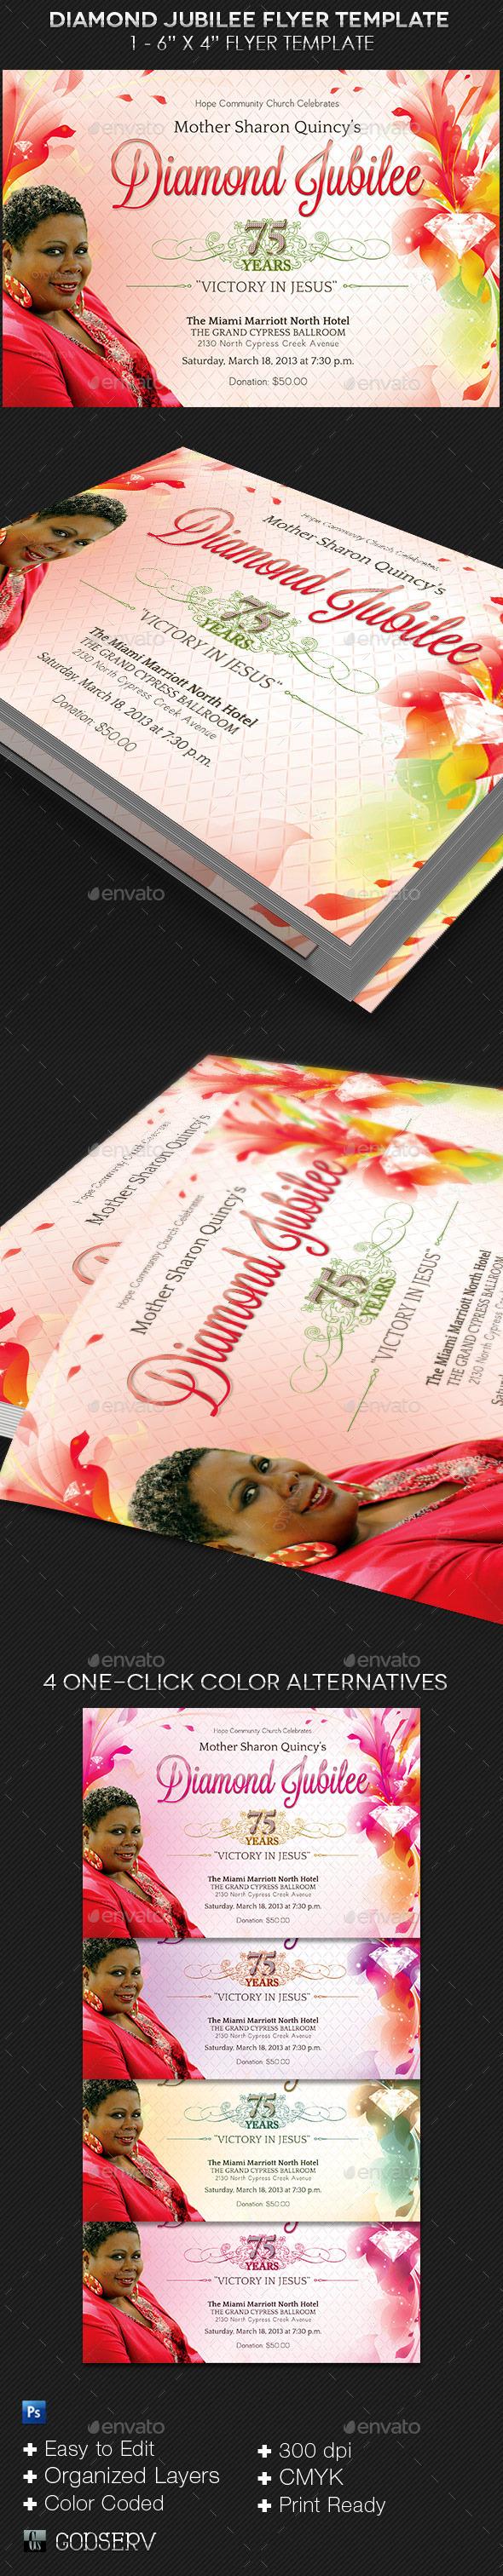 GraphicRiver Diamond Jubilee Flyer Template 10411913